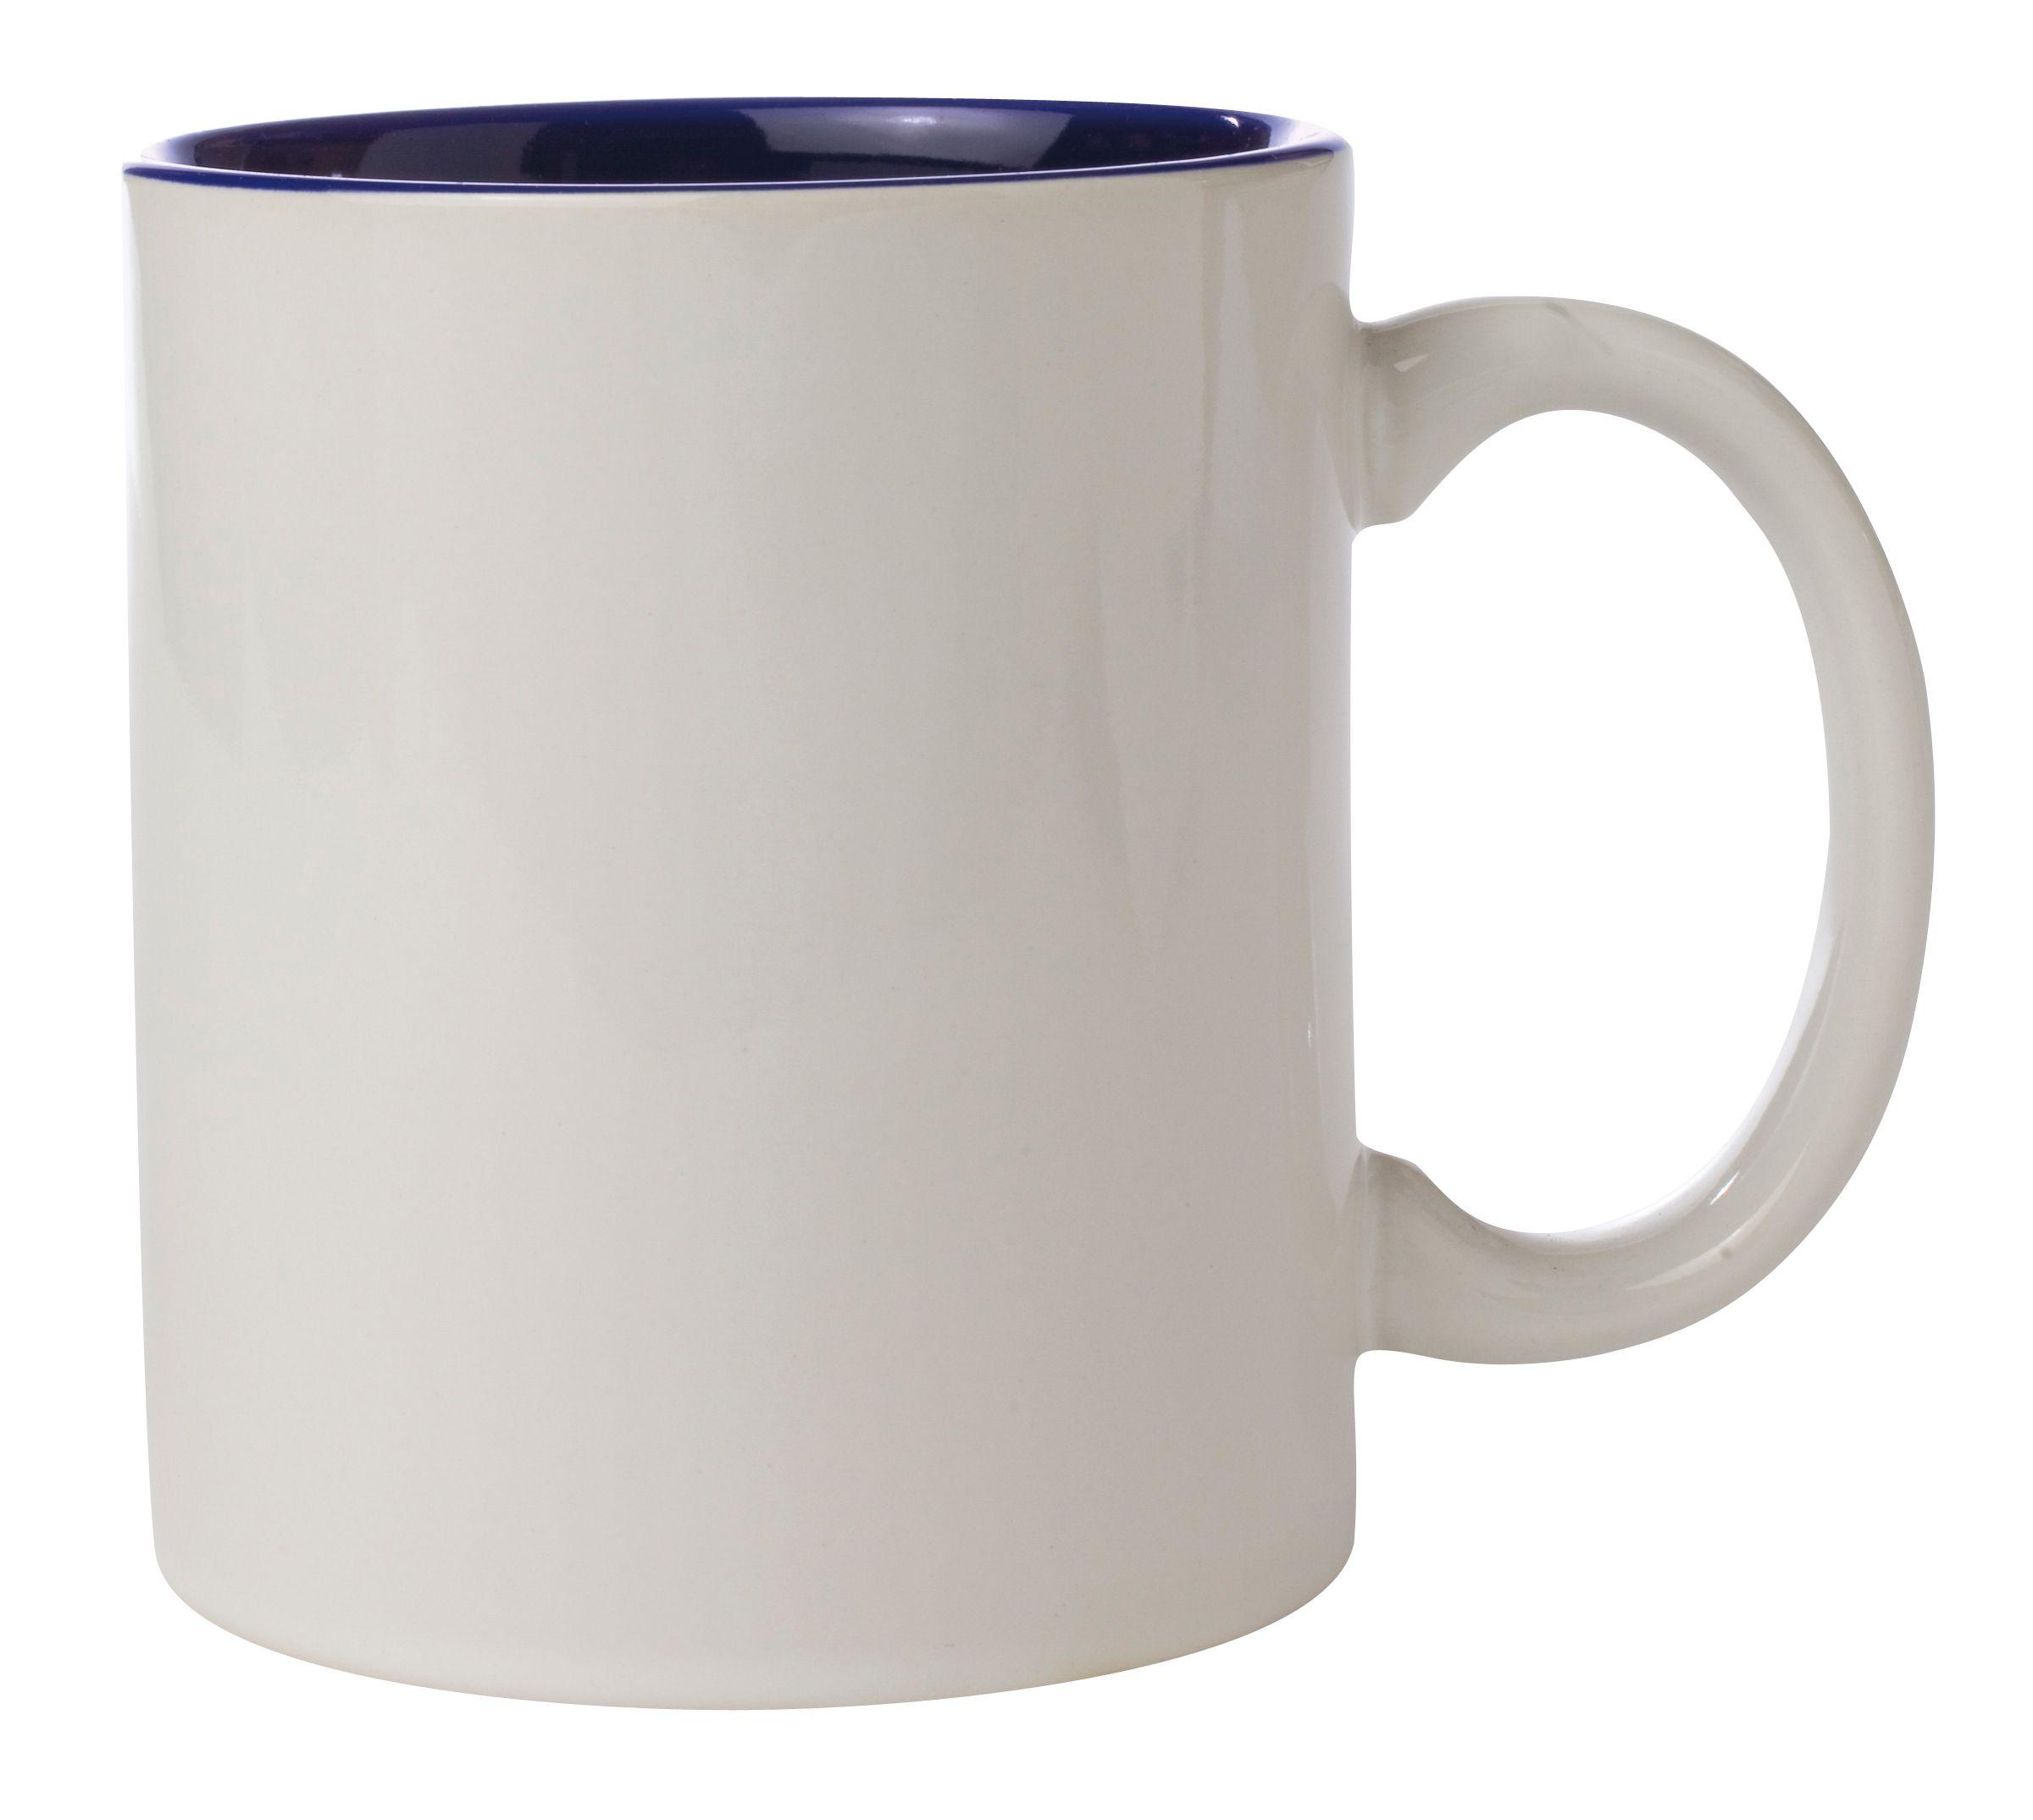 Mug Png Transparent Google Search White Coffee Mugs Mugs Coffee Mugs